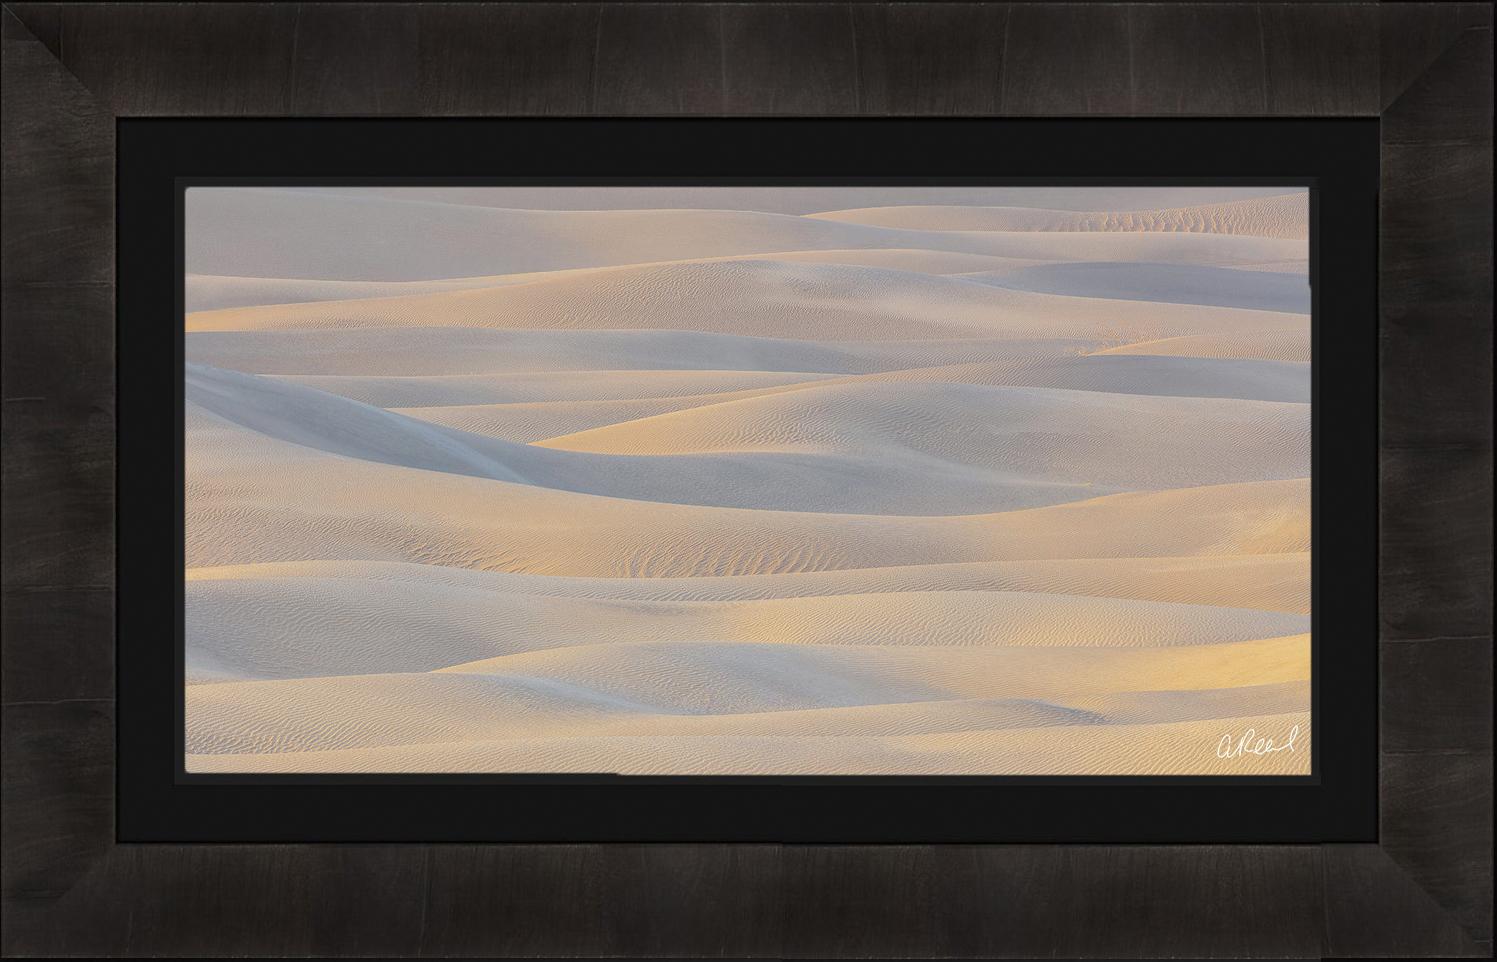 ROMA TRULIFE® LUMACHROME ACRYLIC FINE ART PRINTS | MUSEUM FRAMED print preview